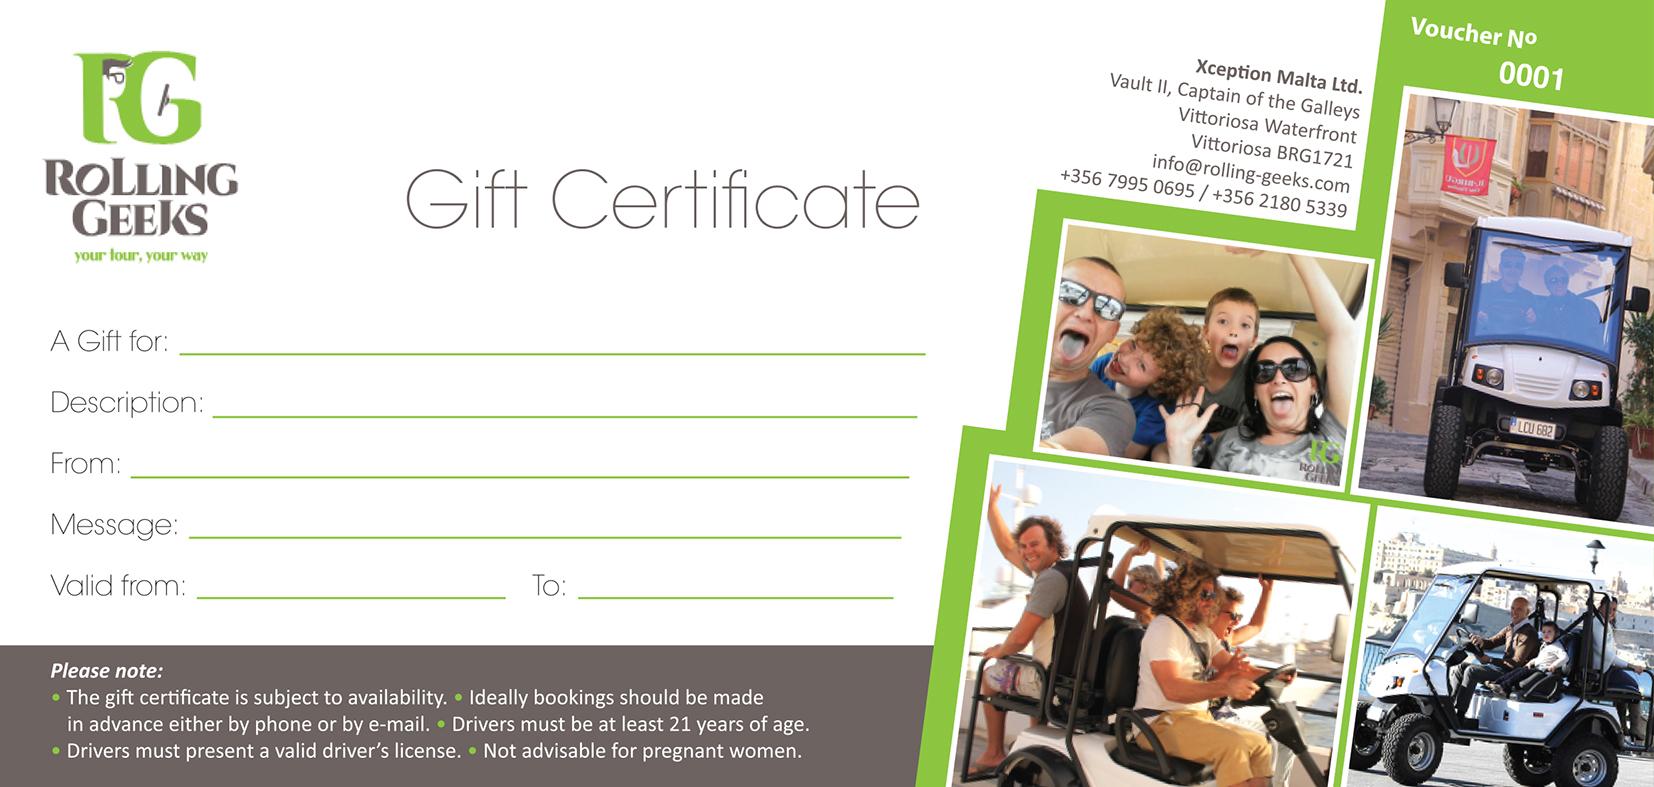 Rolling Geeks, Malta - Gift Certificates